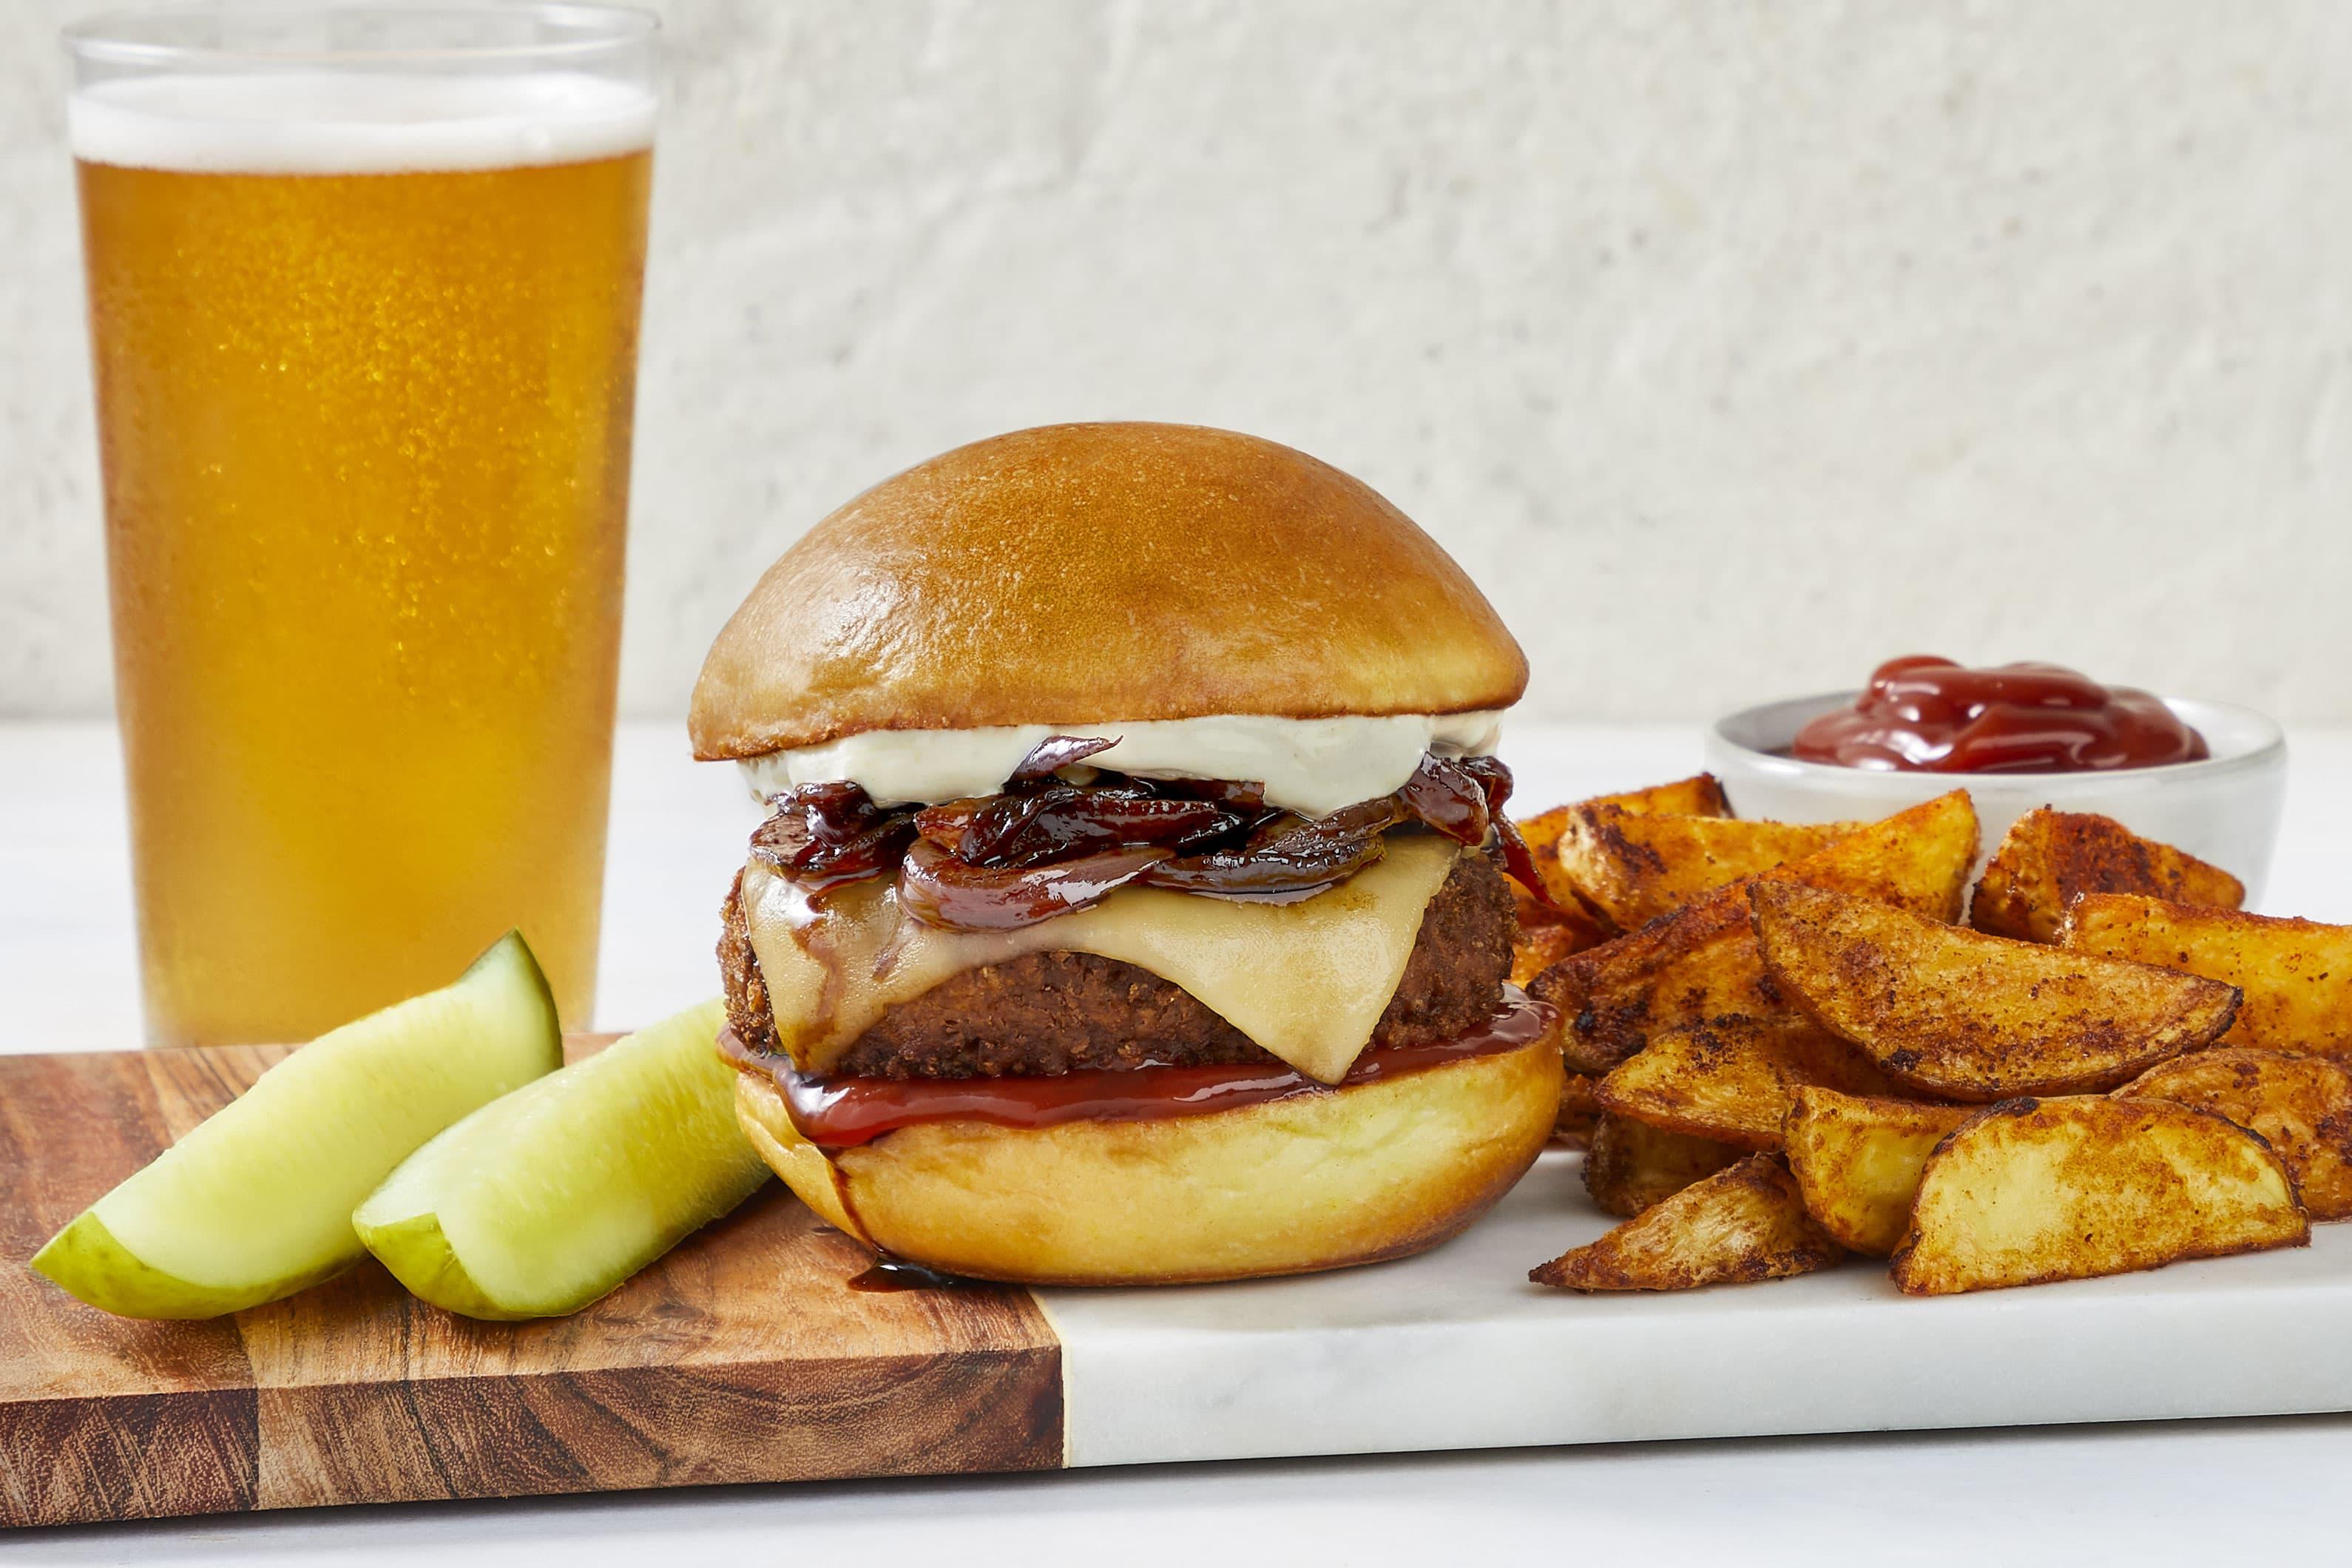 Beyond Meat's vegan burger is heading to HelloFresh meal kits